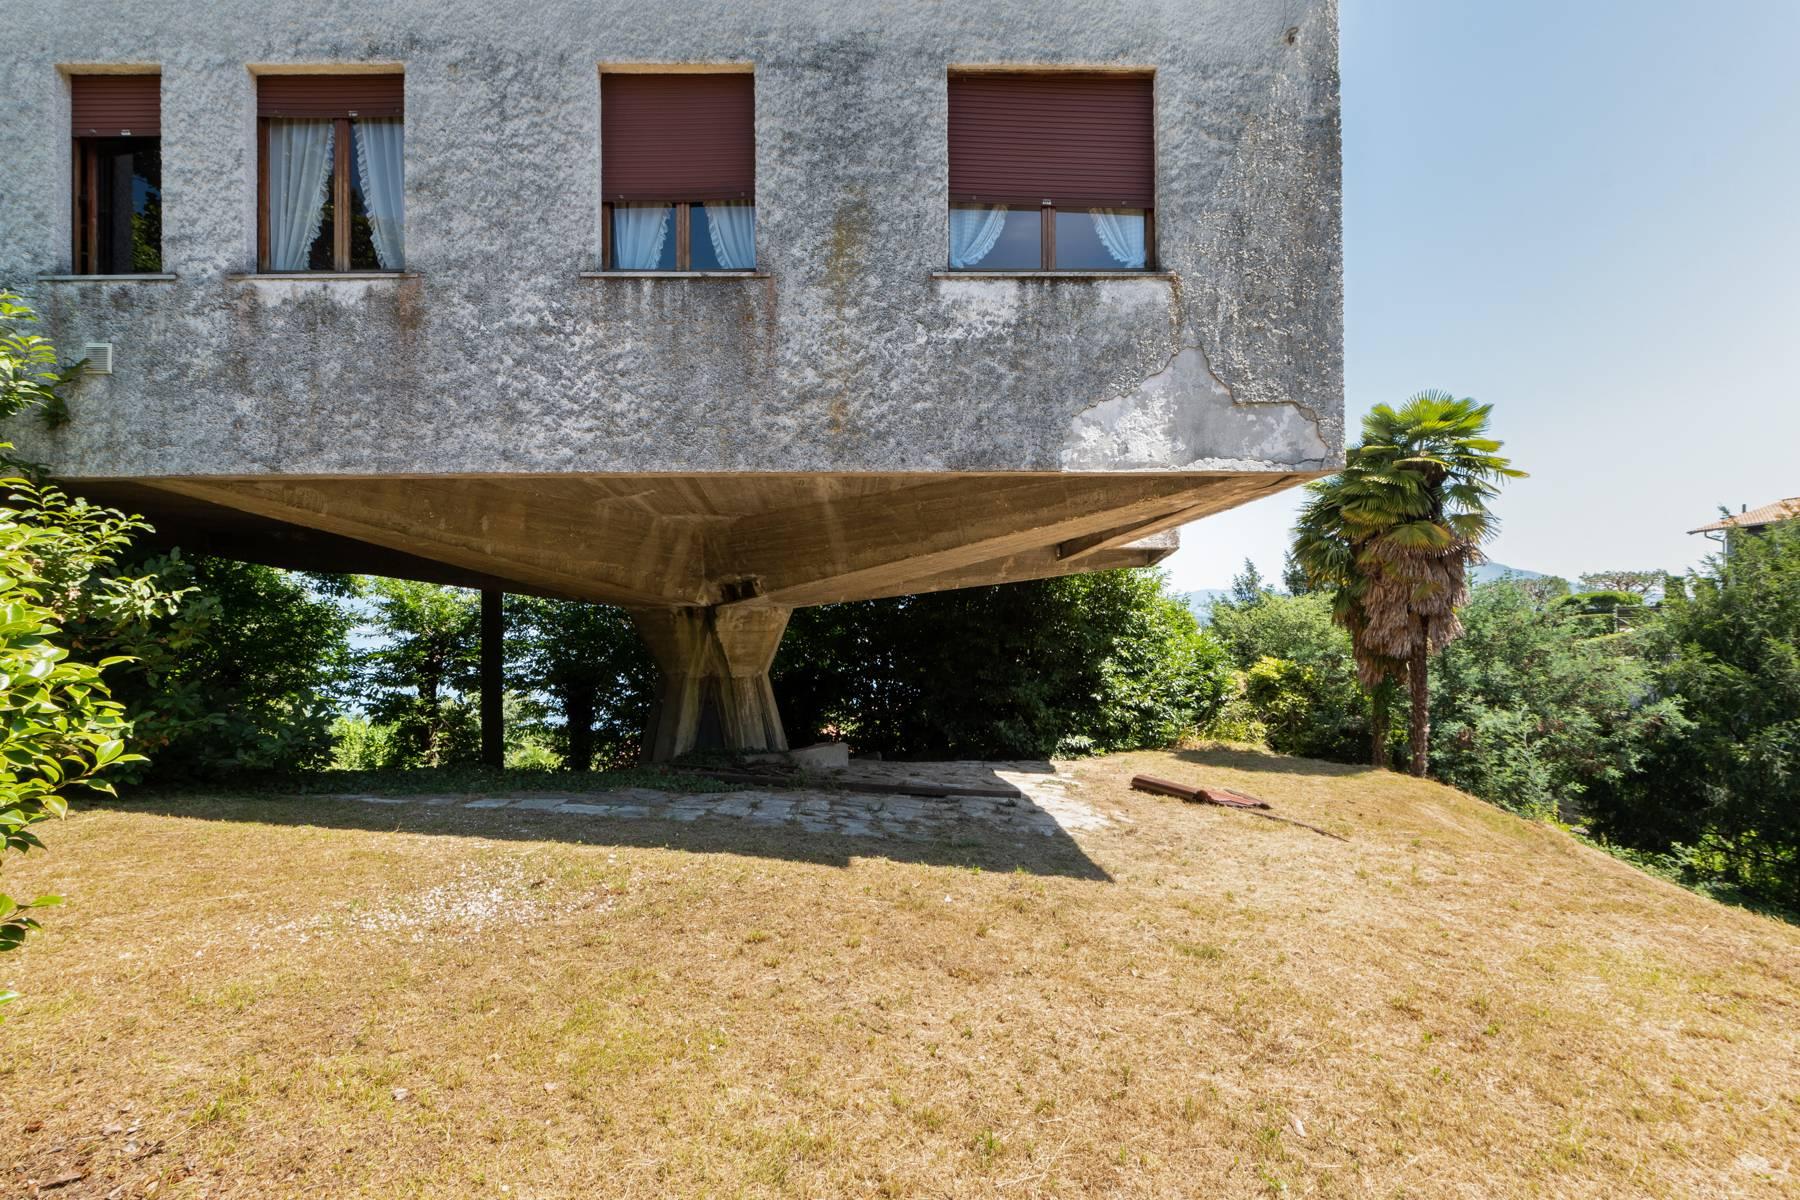 Villa in Vendita a Stresa: 5 locali, 150 mq - Foto 26